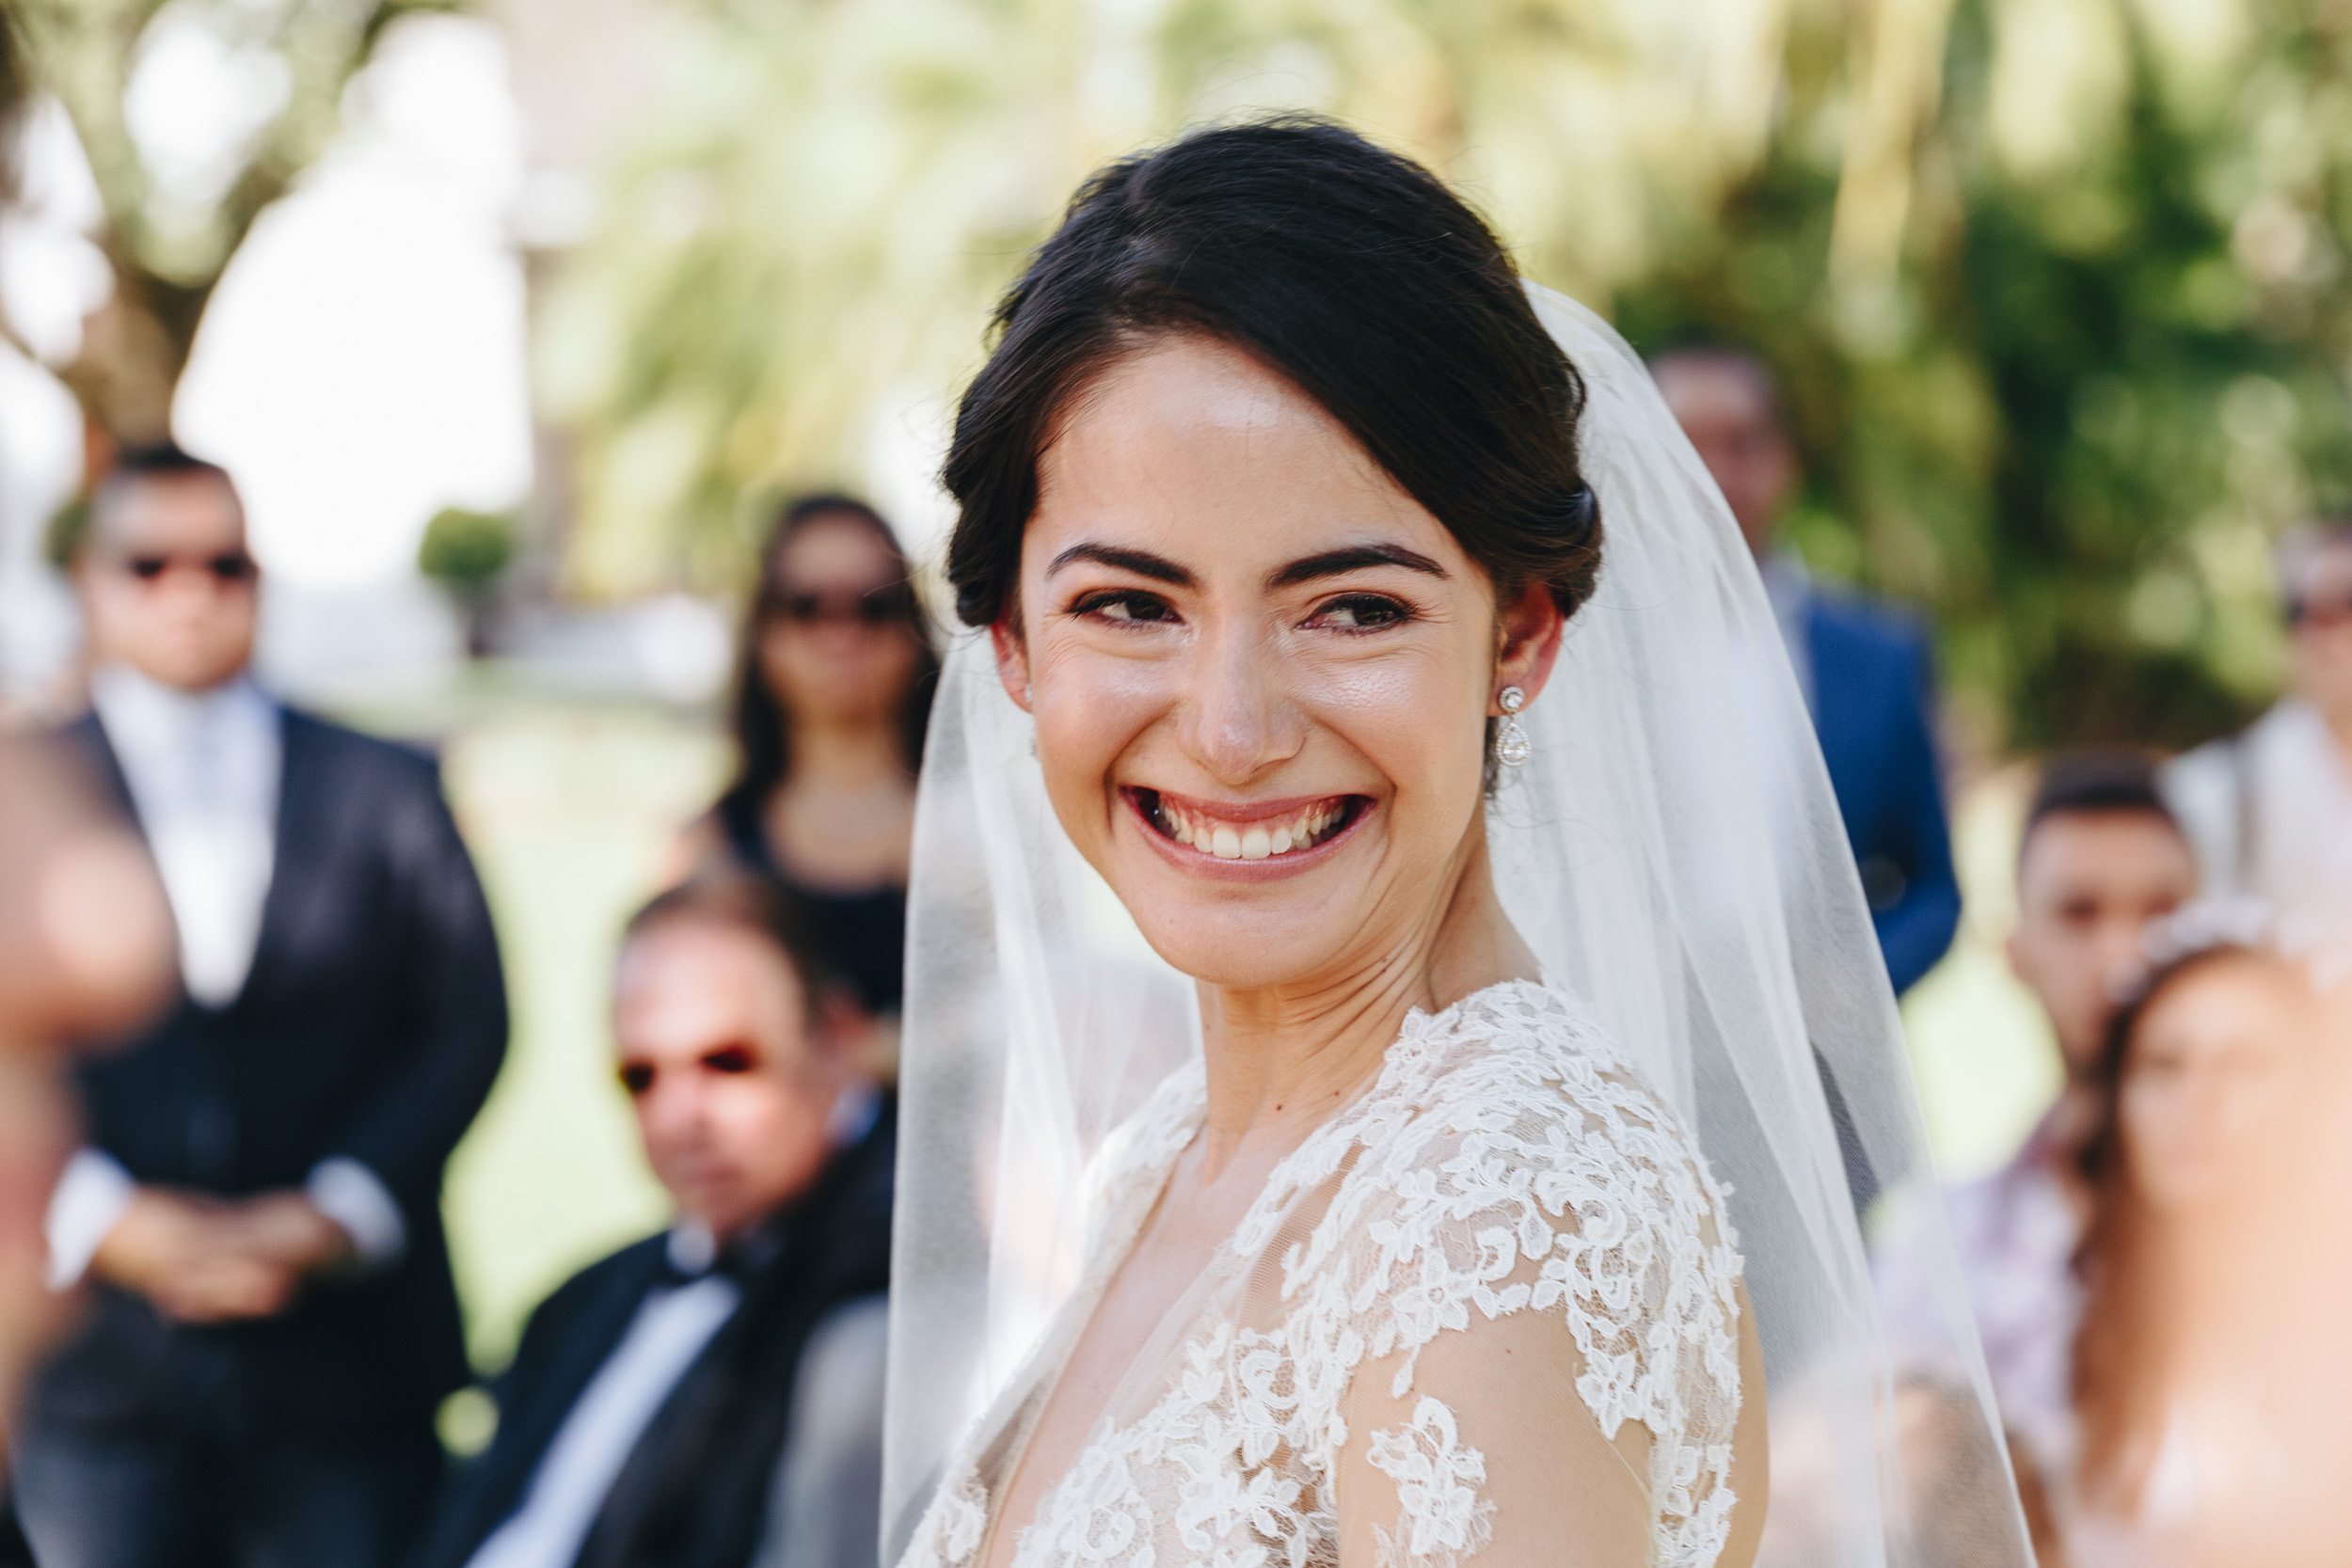 Jenny-Rockett-John-Scranton-Cape-Town-Wedding-Photographer-Andrea-Kellan-88.jpg